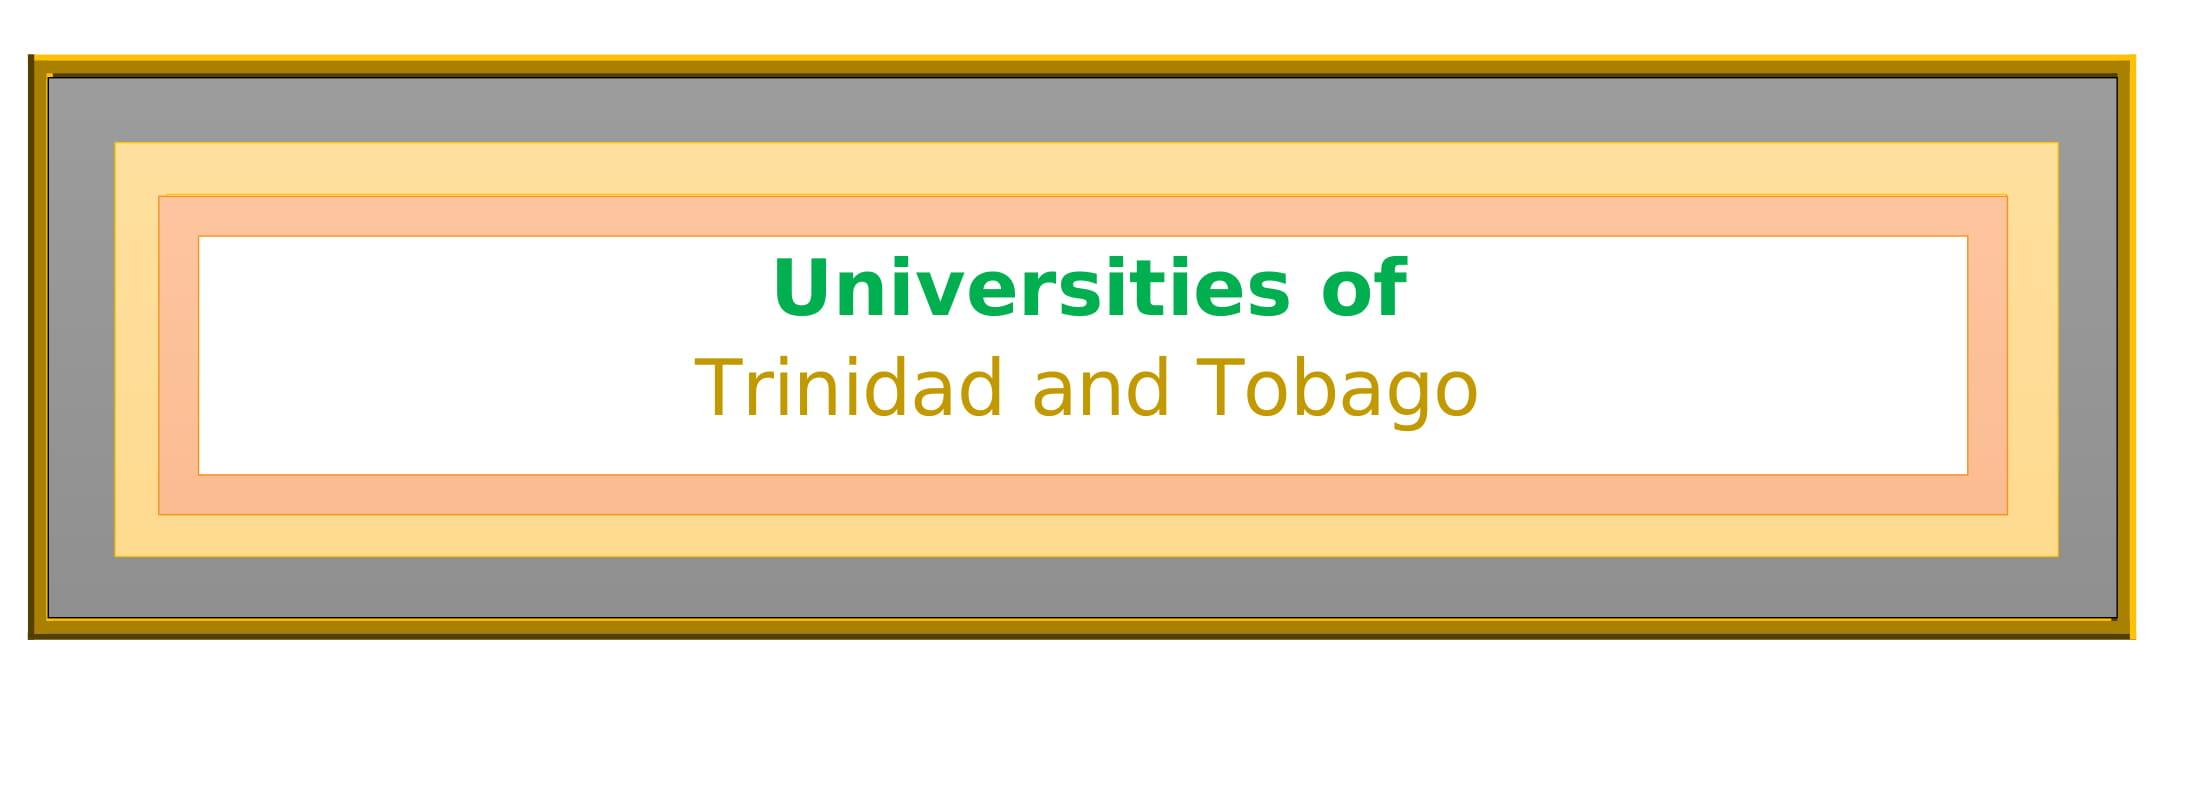 List of Universities in Trinidad and Tobago